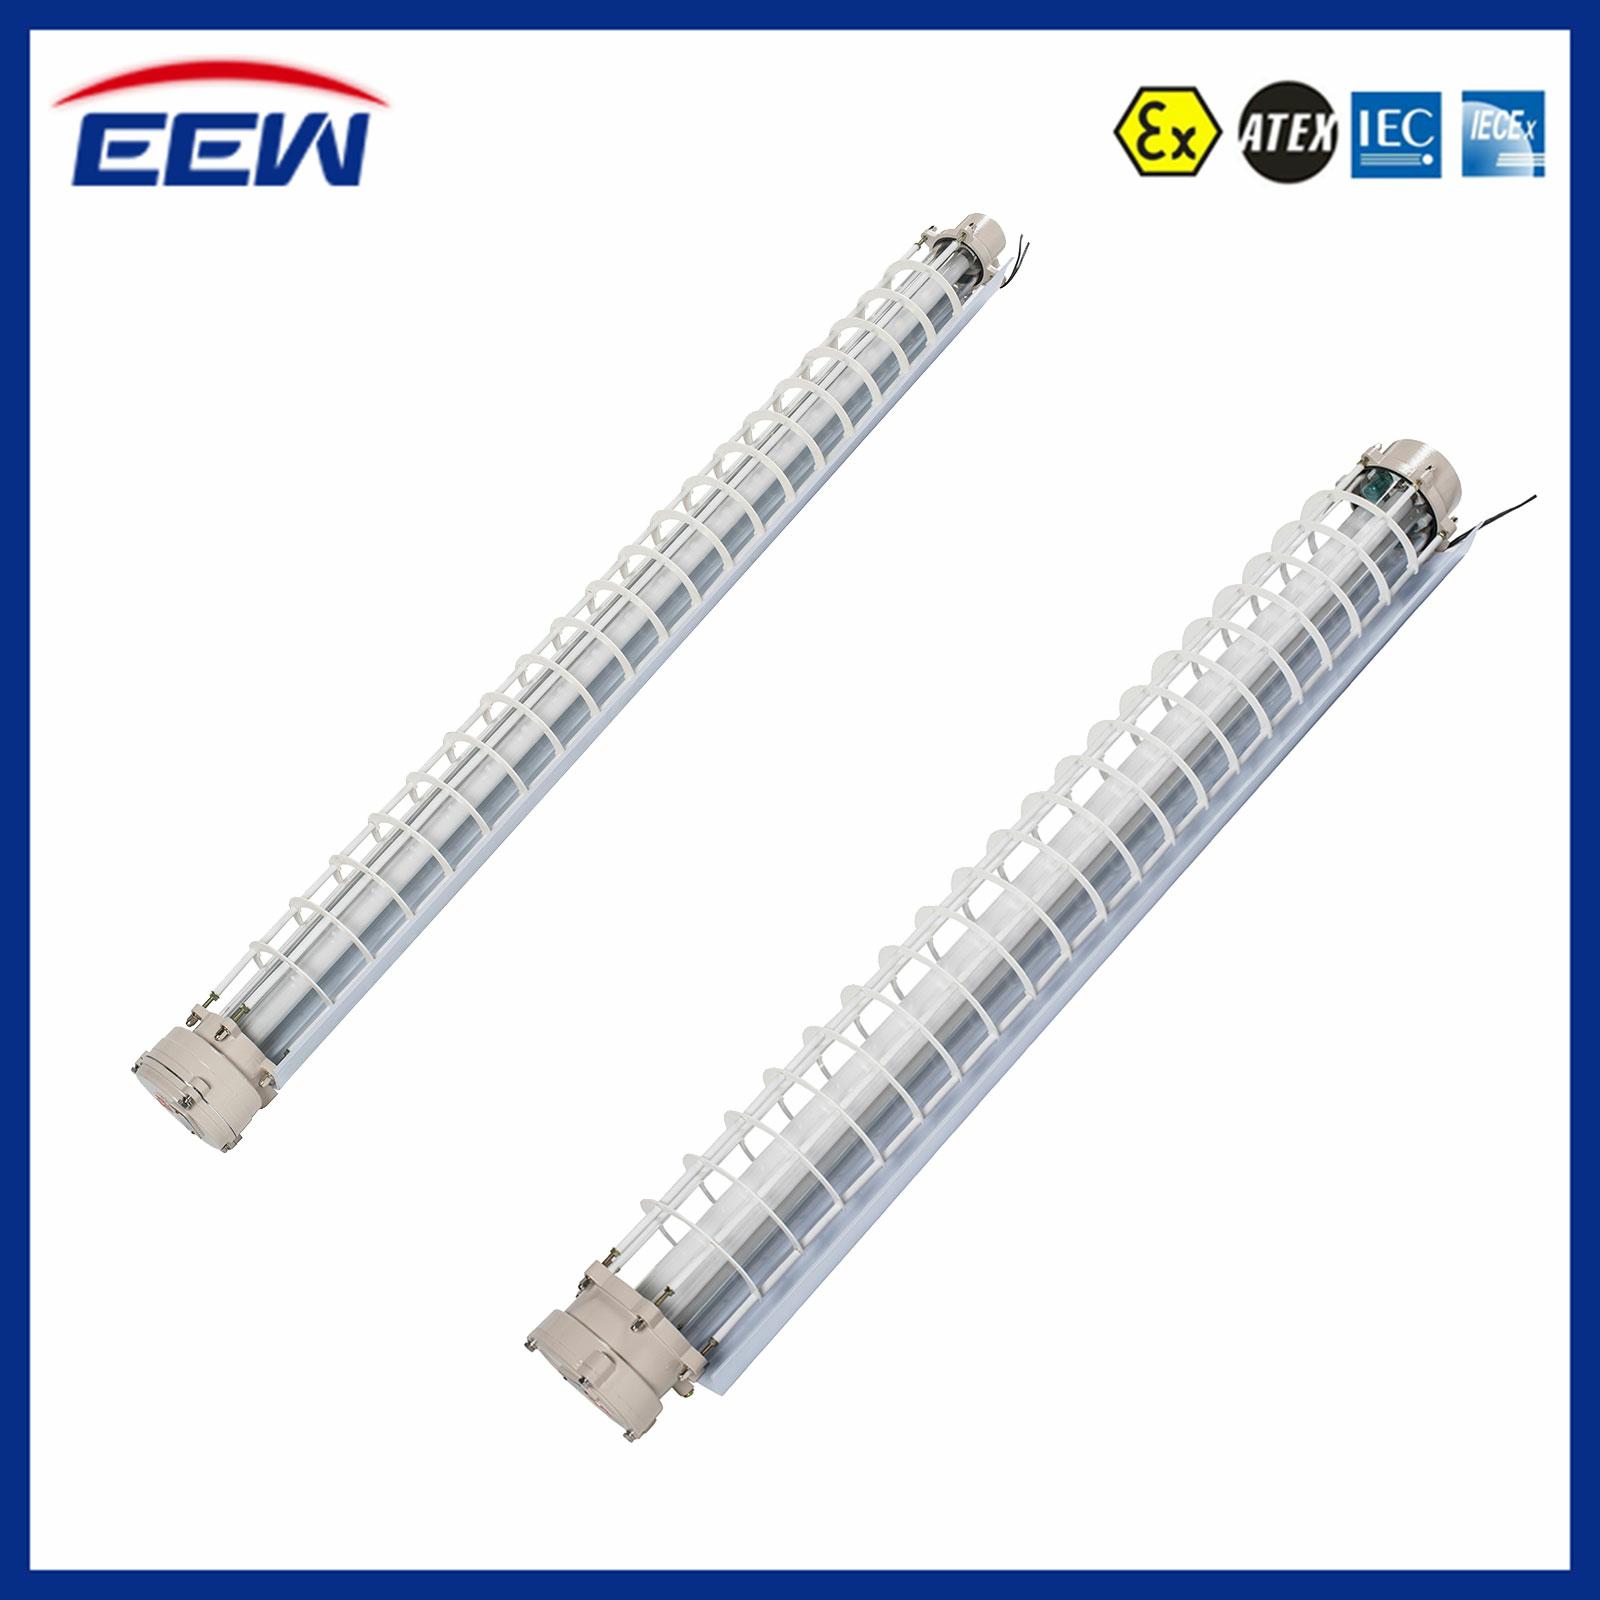 Lampu Neon / TL Explosion Proof Fluorescent Light 1x18W LED BPY HRLM